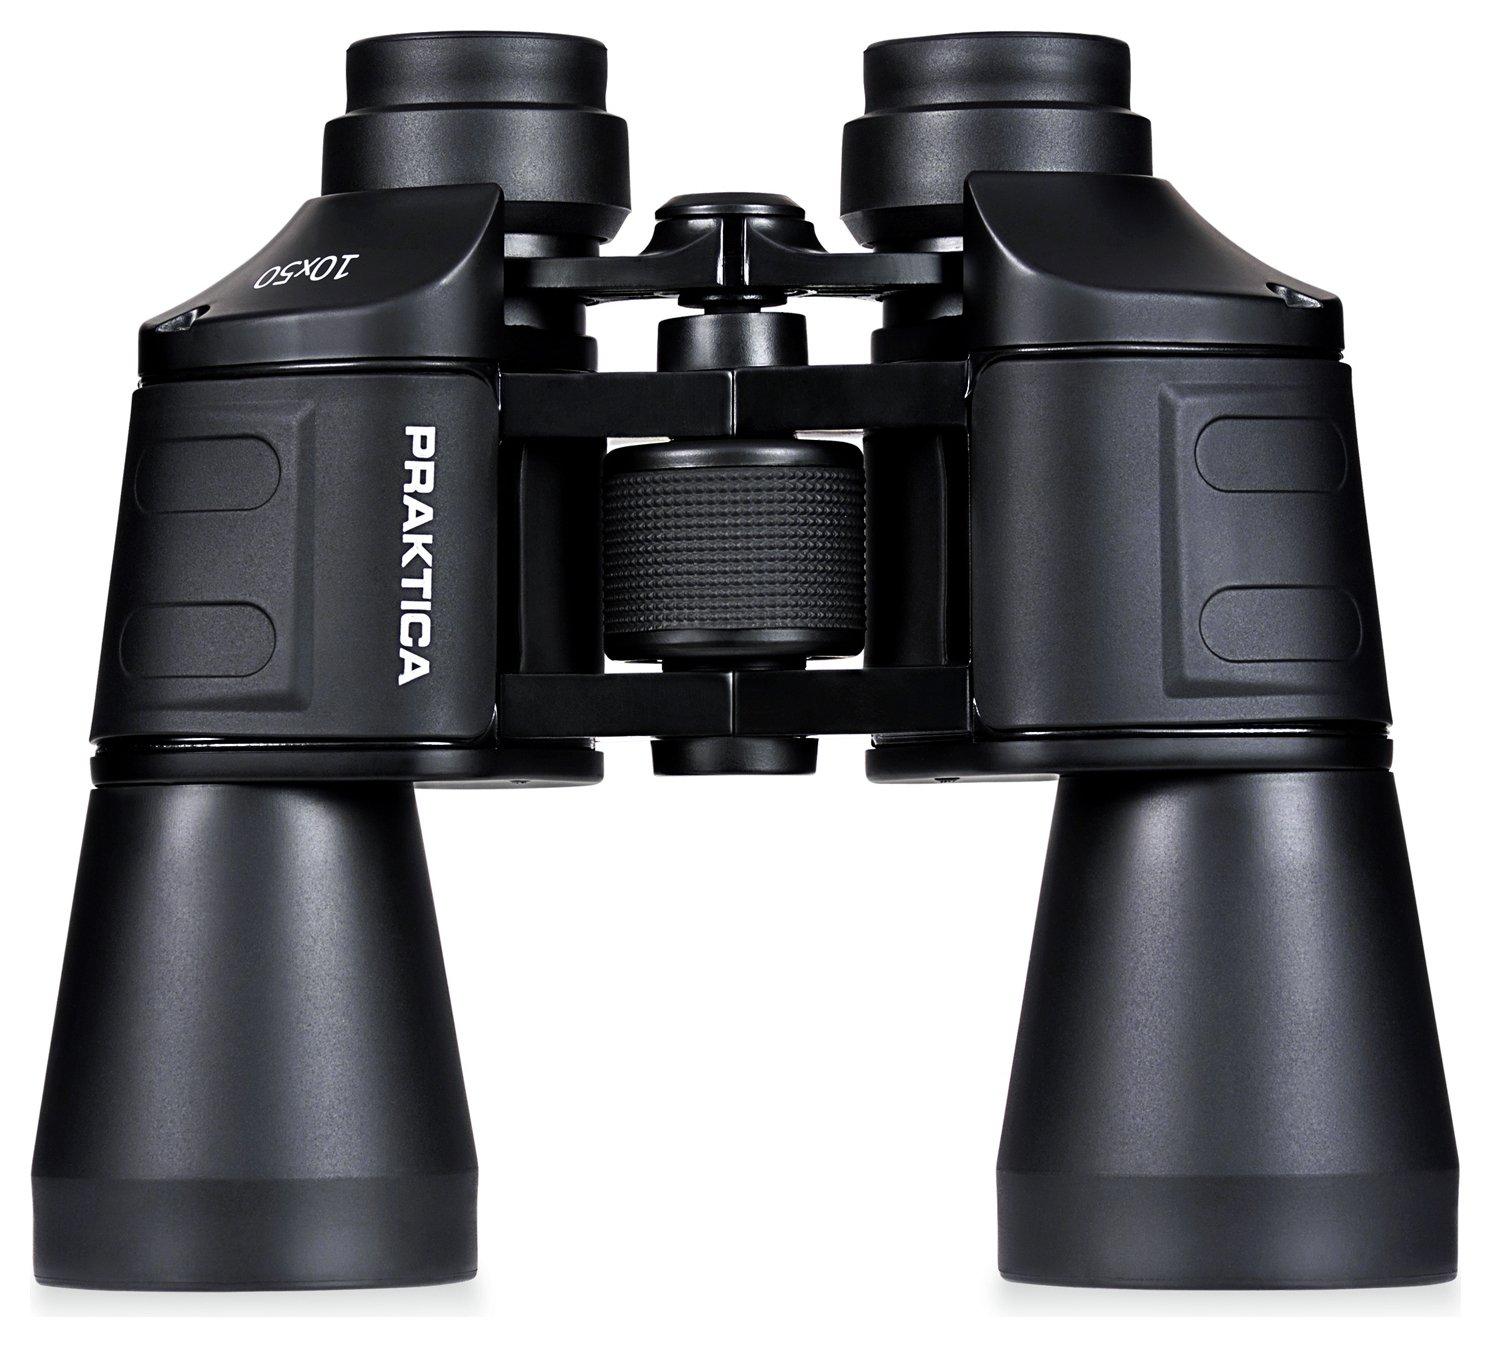 Praktica Falcon 10x50mm Binoculars.